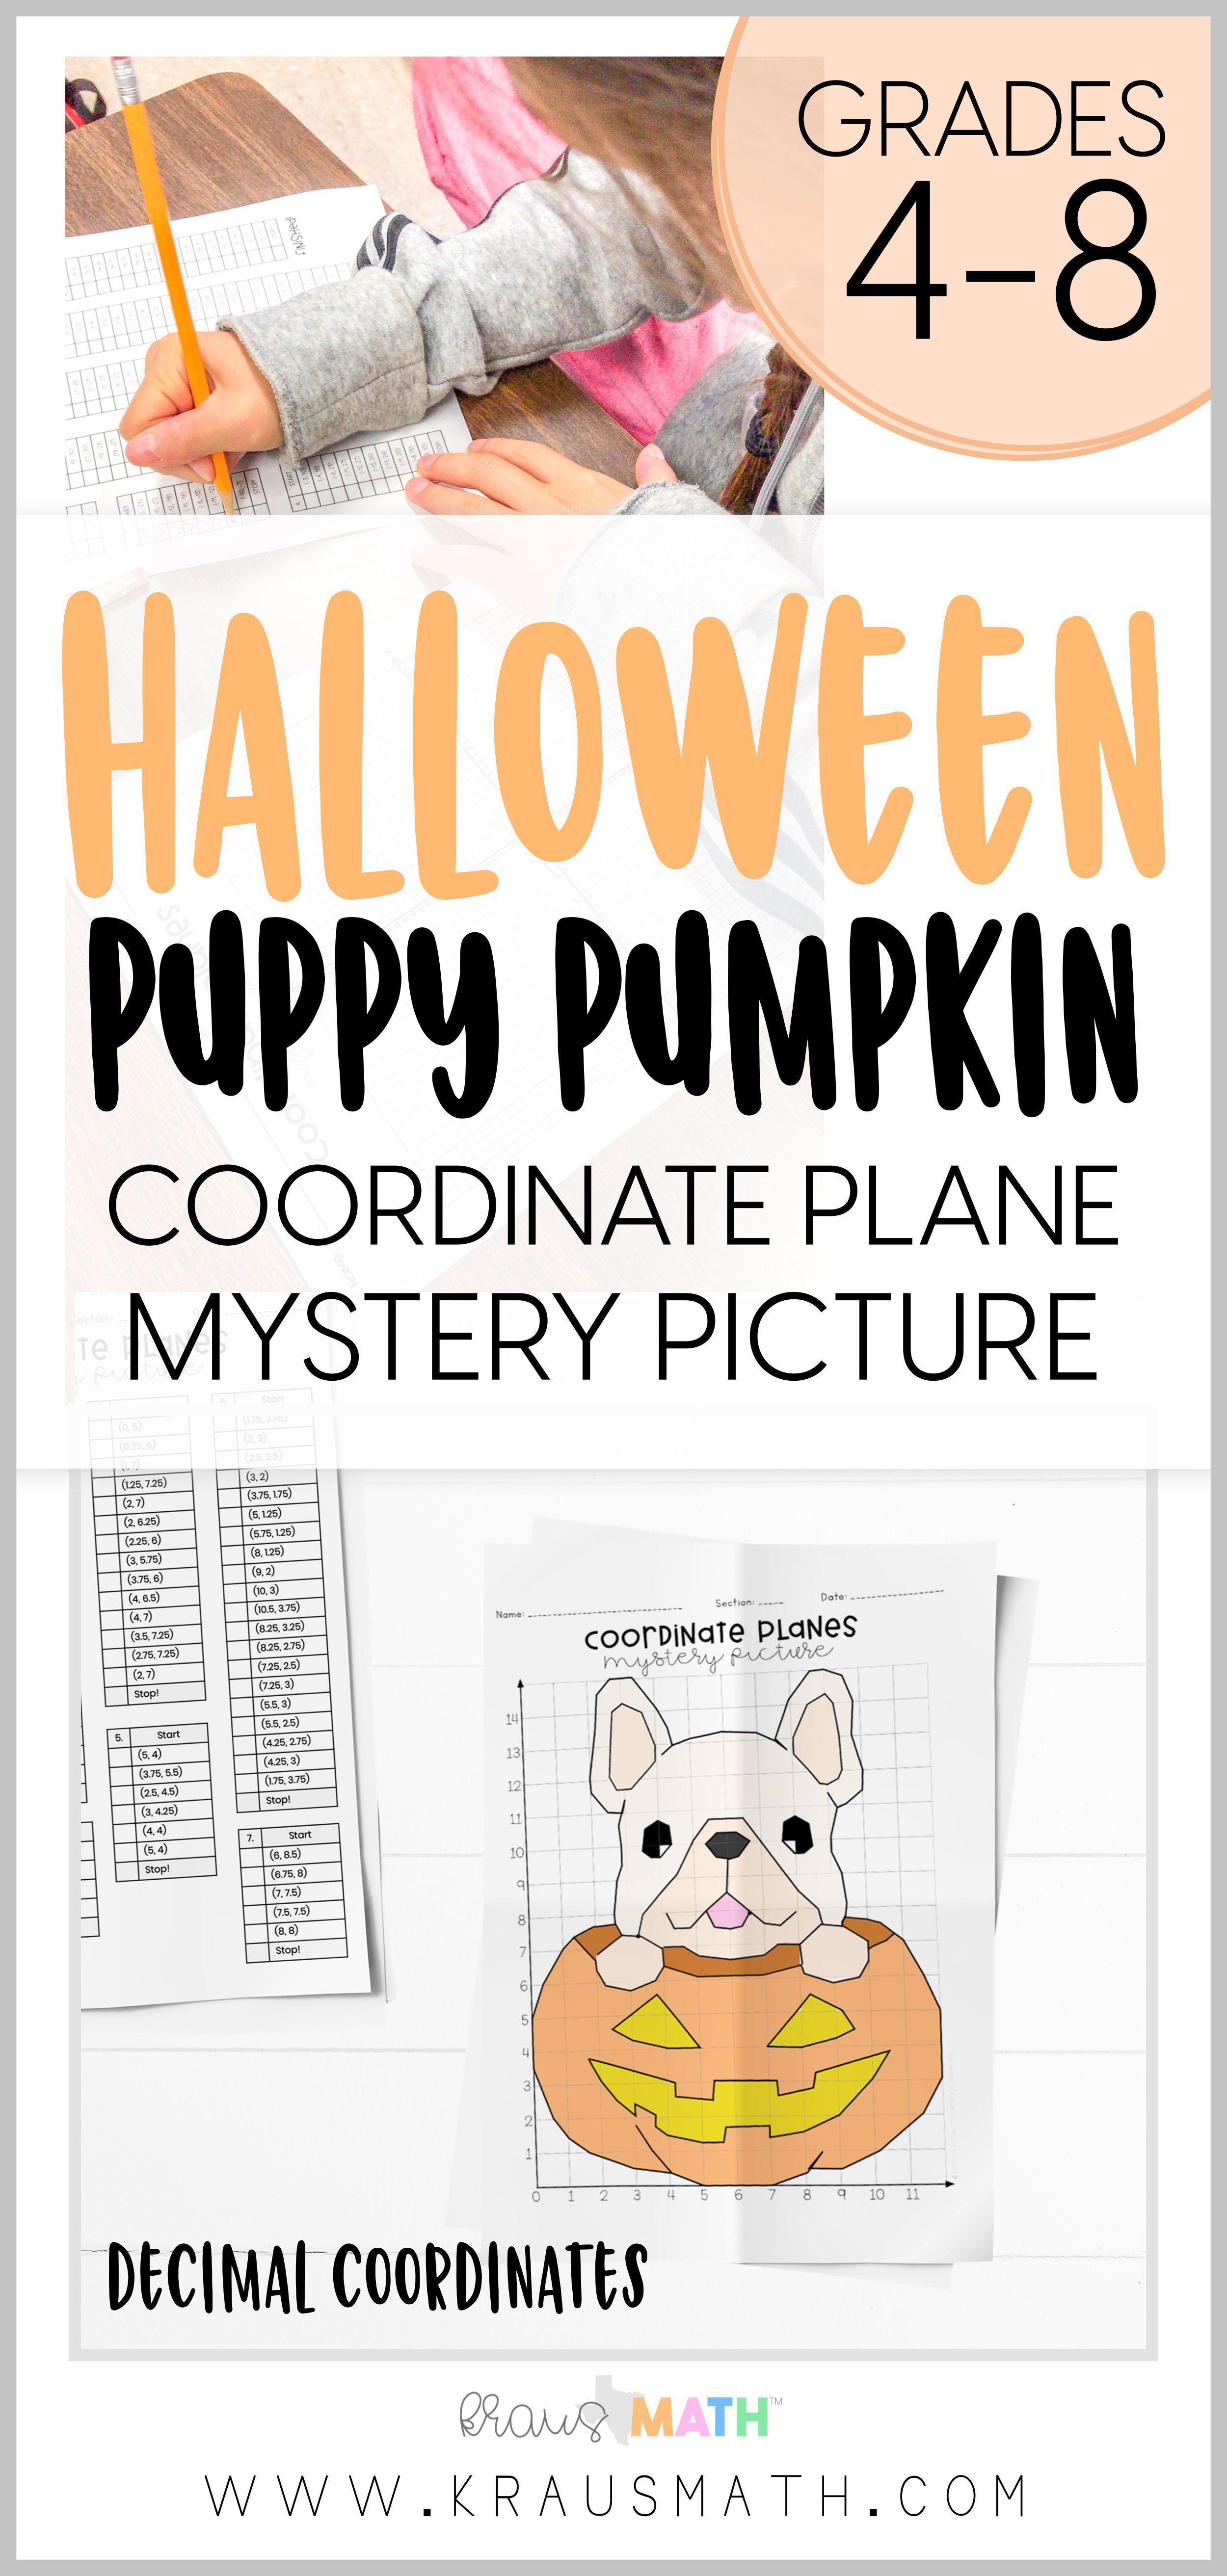 Cute Pumpkin Pug Coordinate Plane Mystery Picture 1st